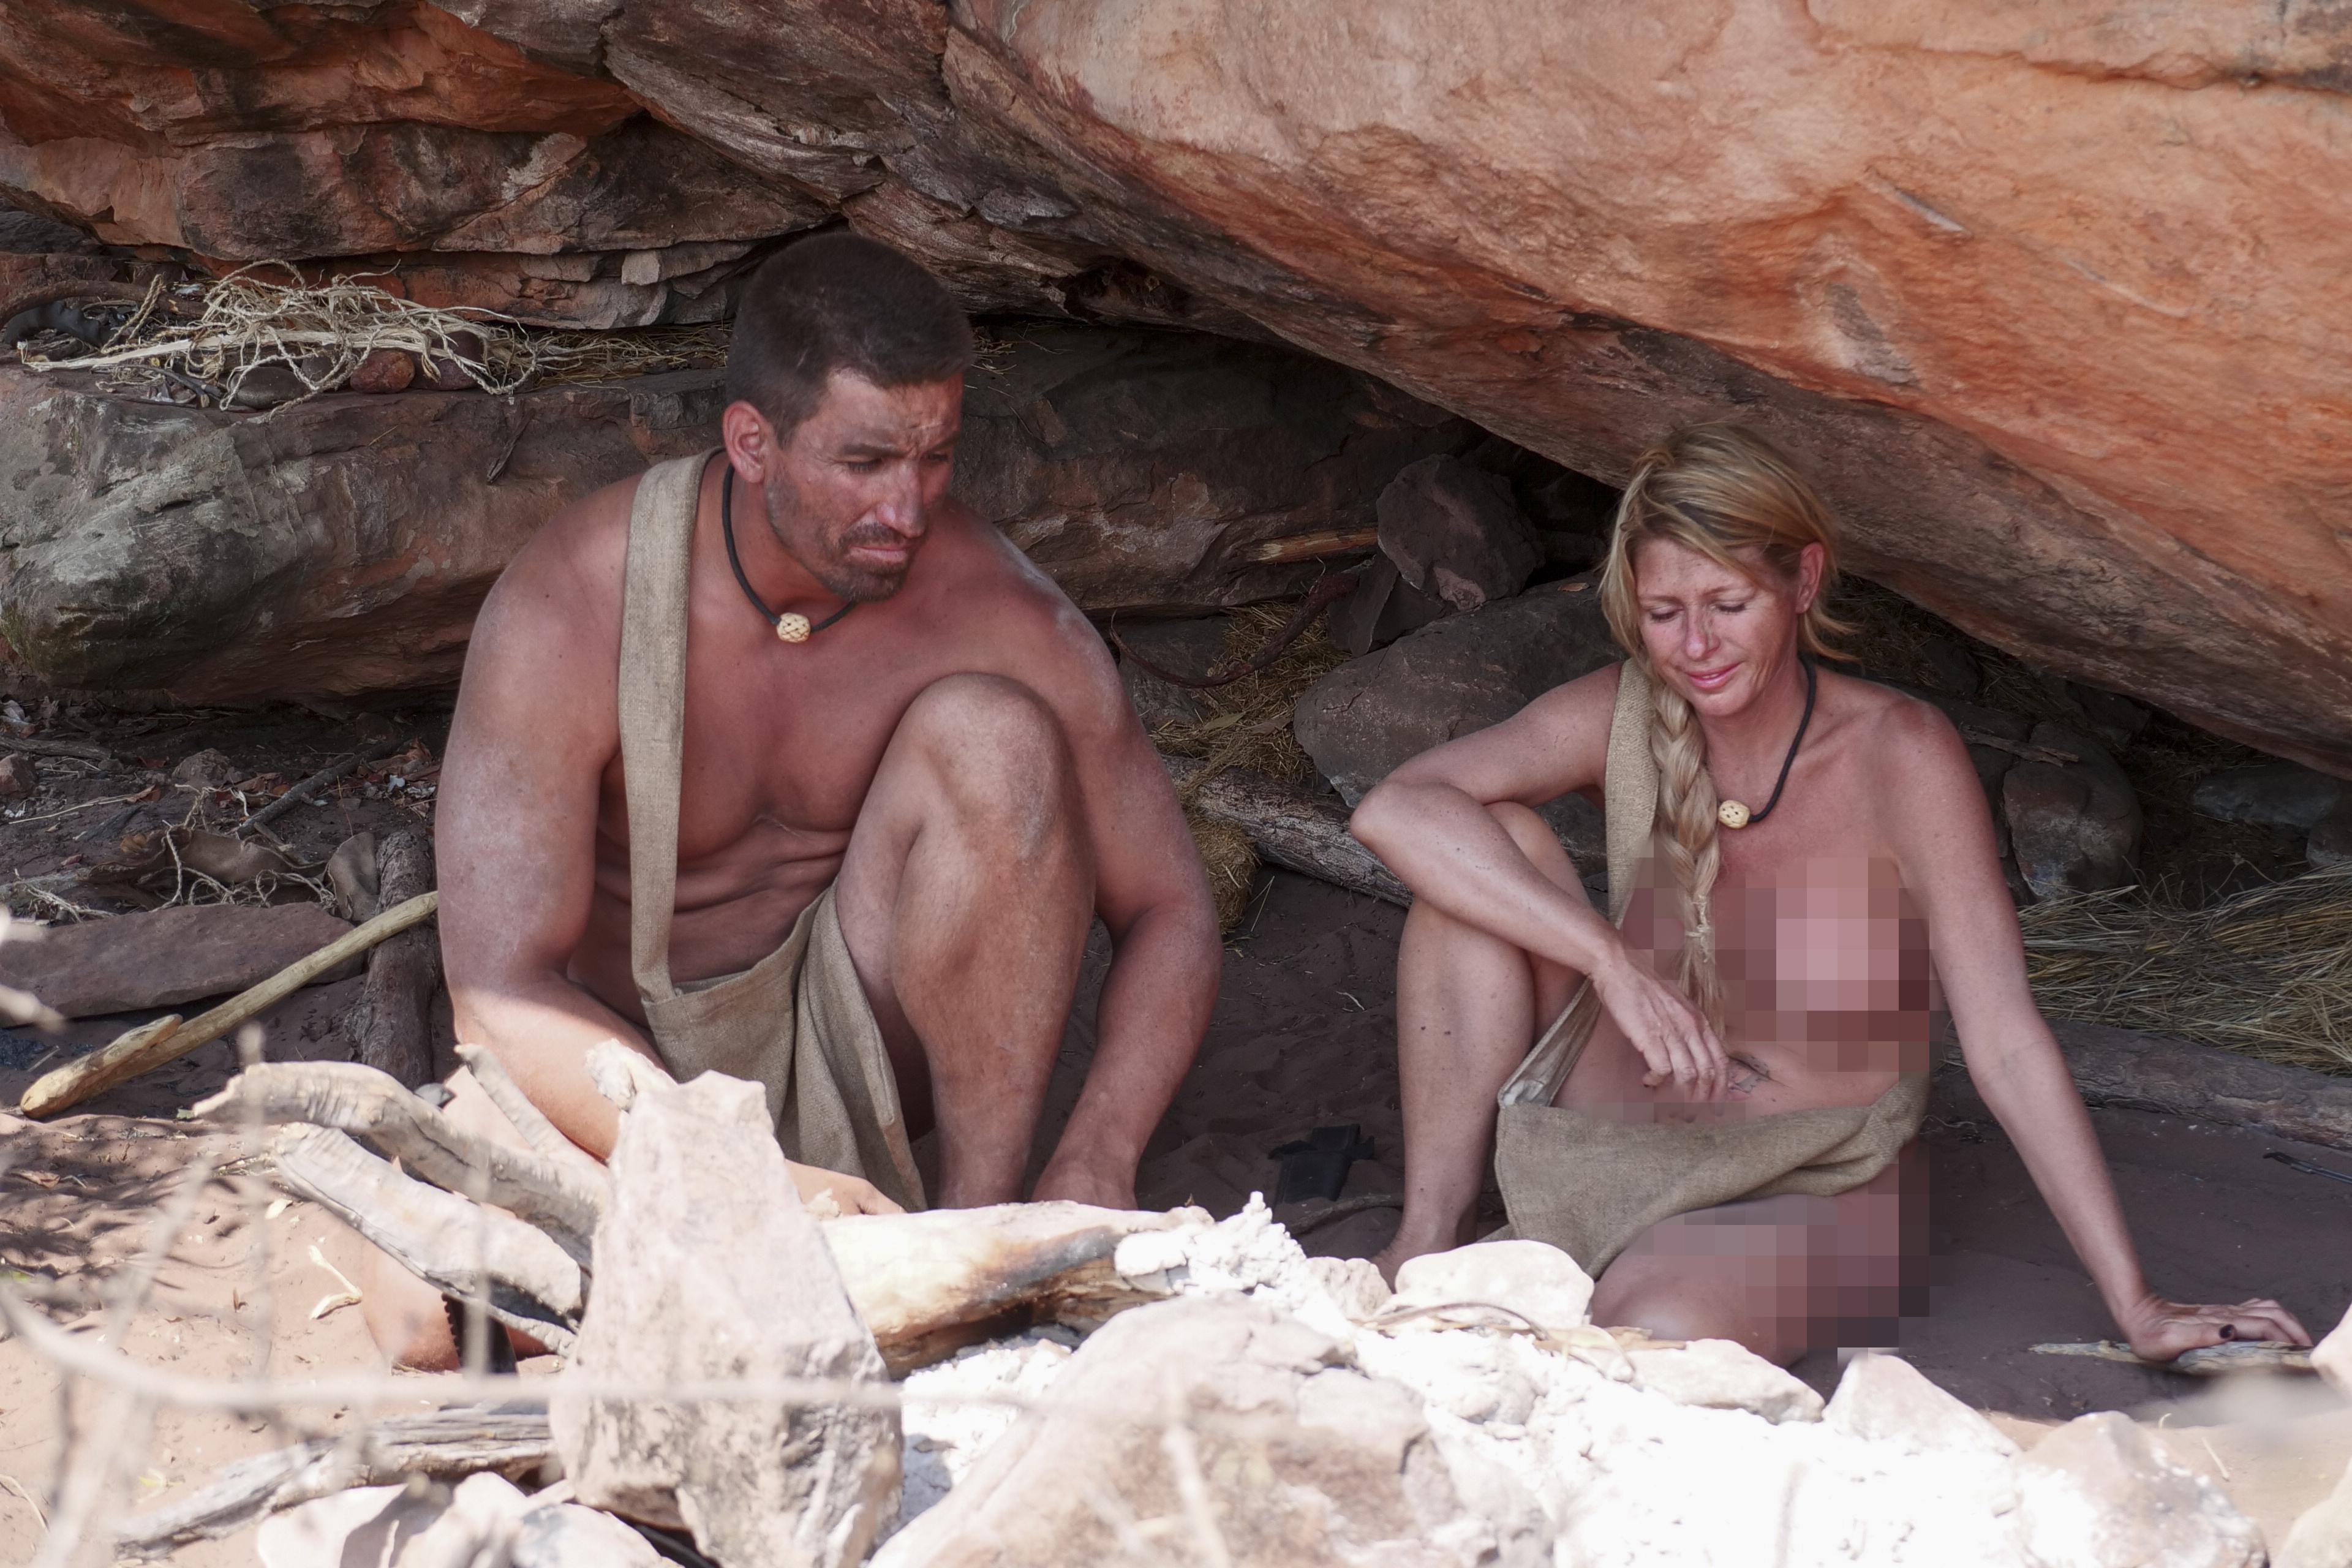 Pics of naked blonde women